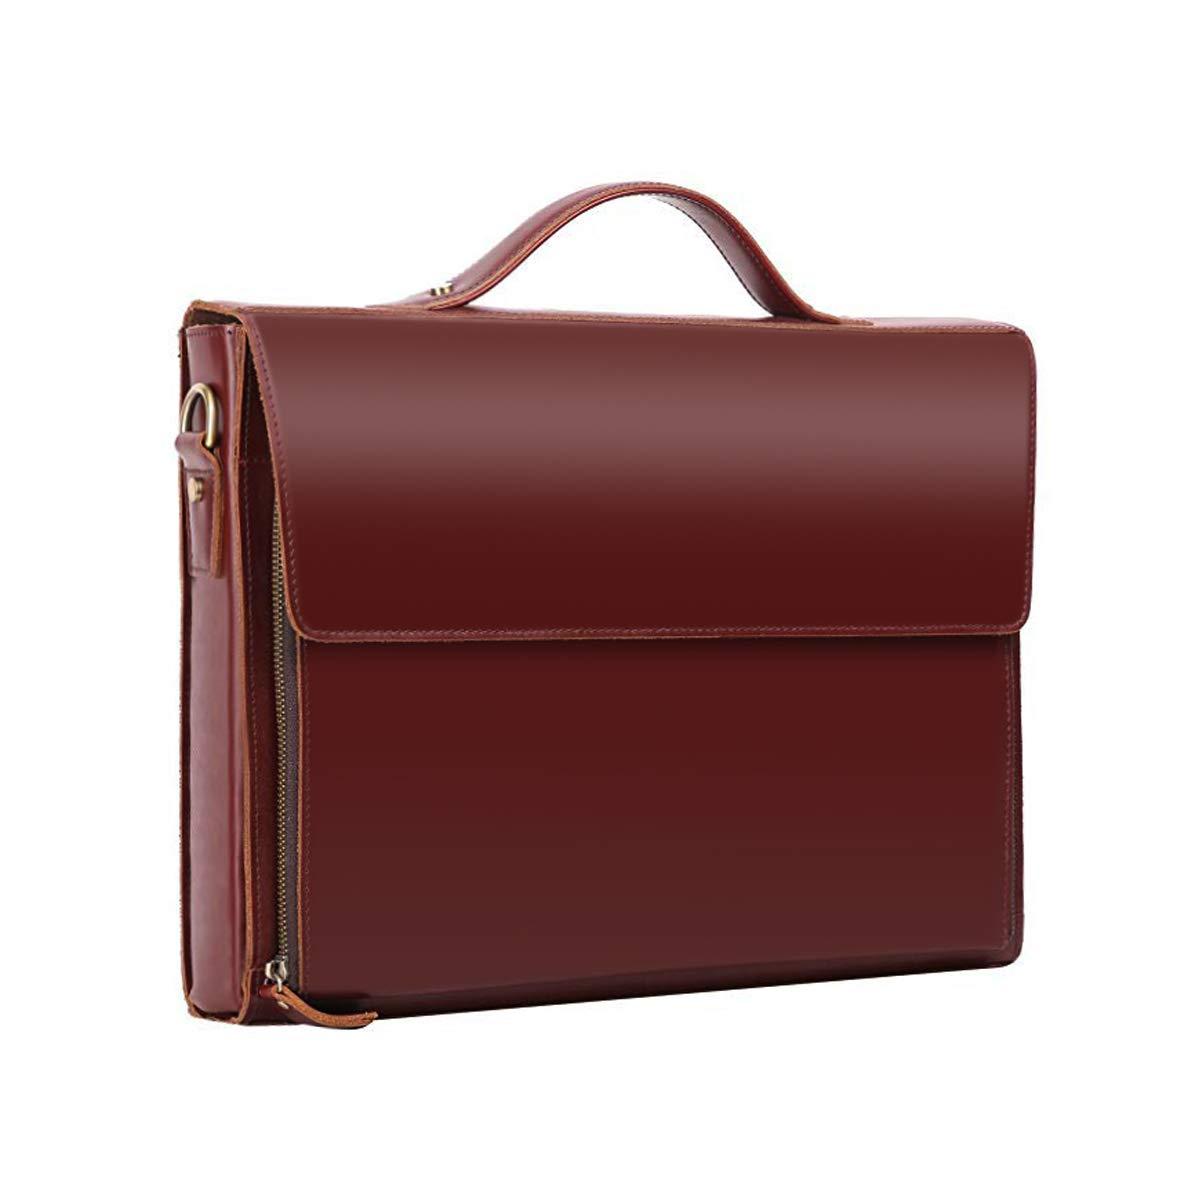 e82e7fb3dd64 Amazon.com: Leathario Leather Briefcase for Men Leather Laptop Bag Shoulder  Messenger Bag Business Work Bag: Leathario